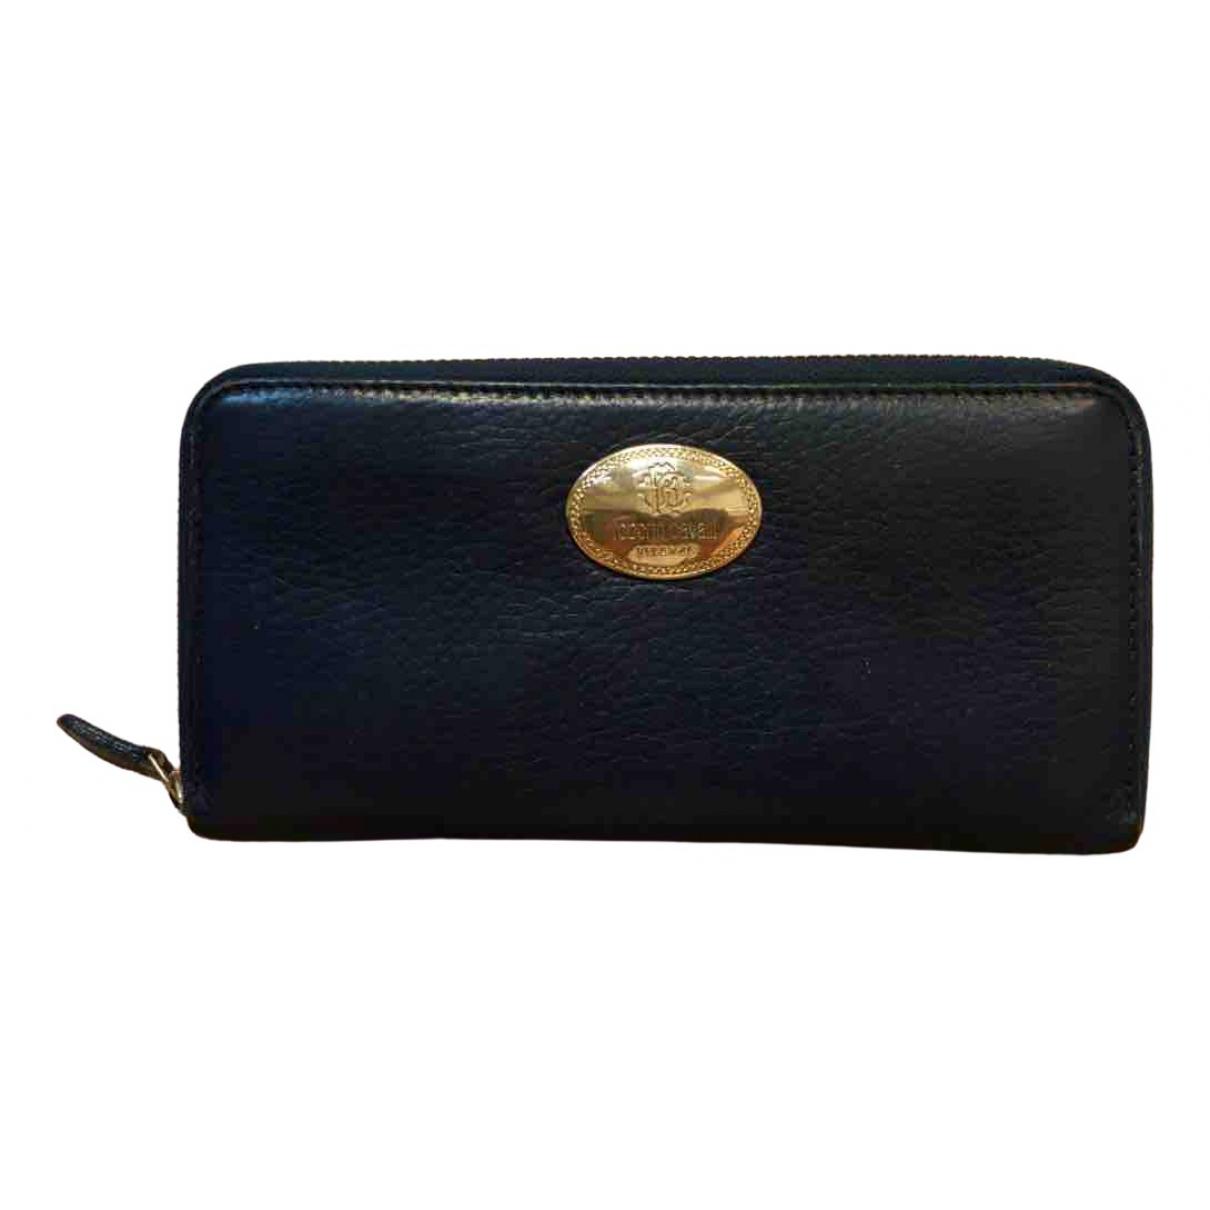 Roberto Cavalli - Portefeuille   pour femme en cuir - bleu